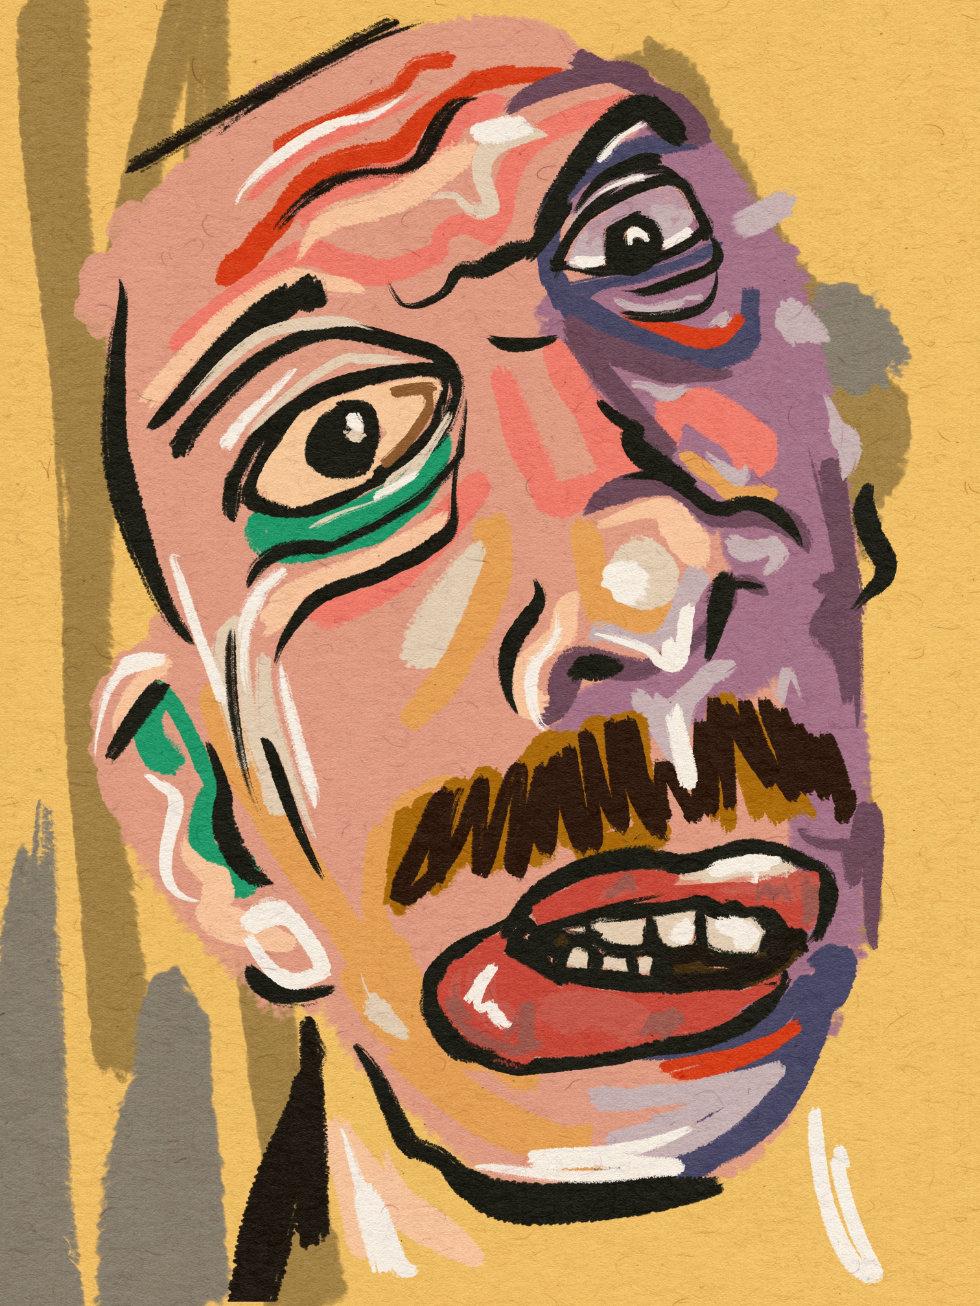 Grooves Unstable Fugazi Moustache Observe Week 35